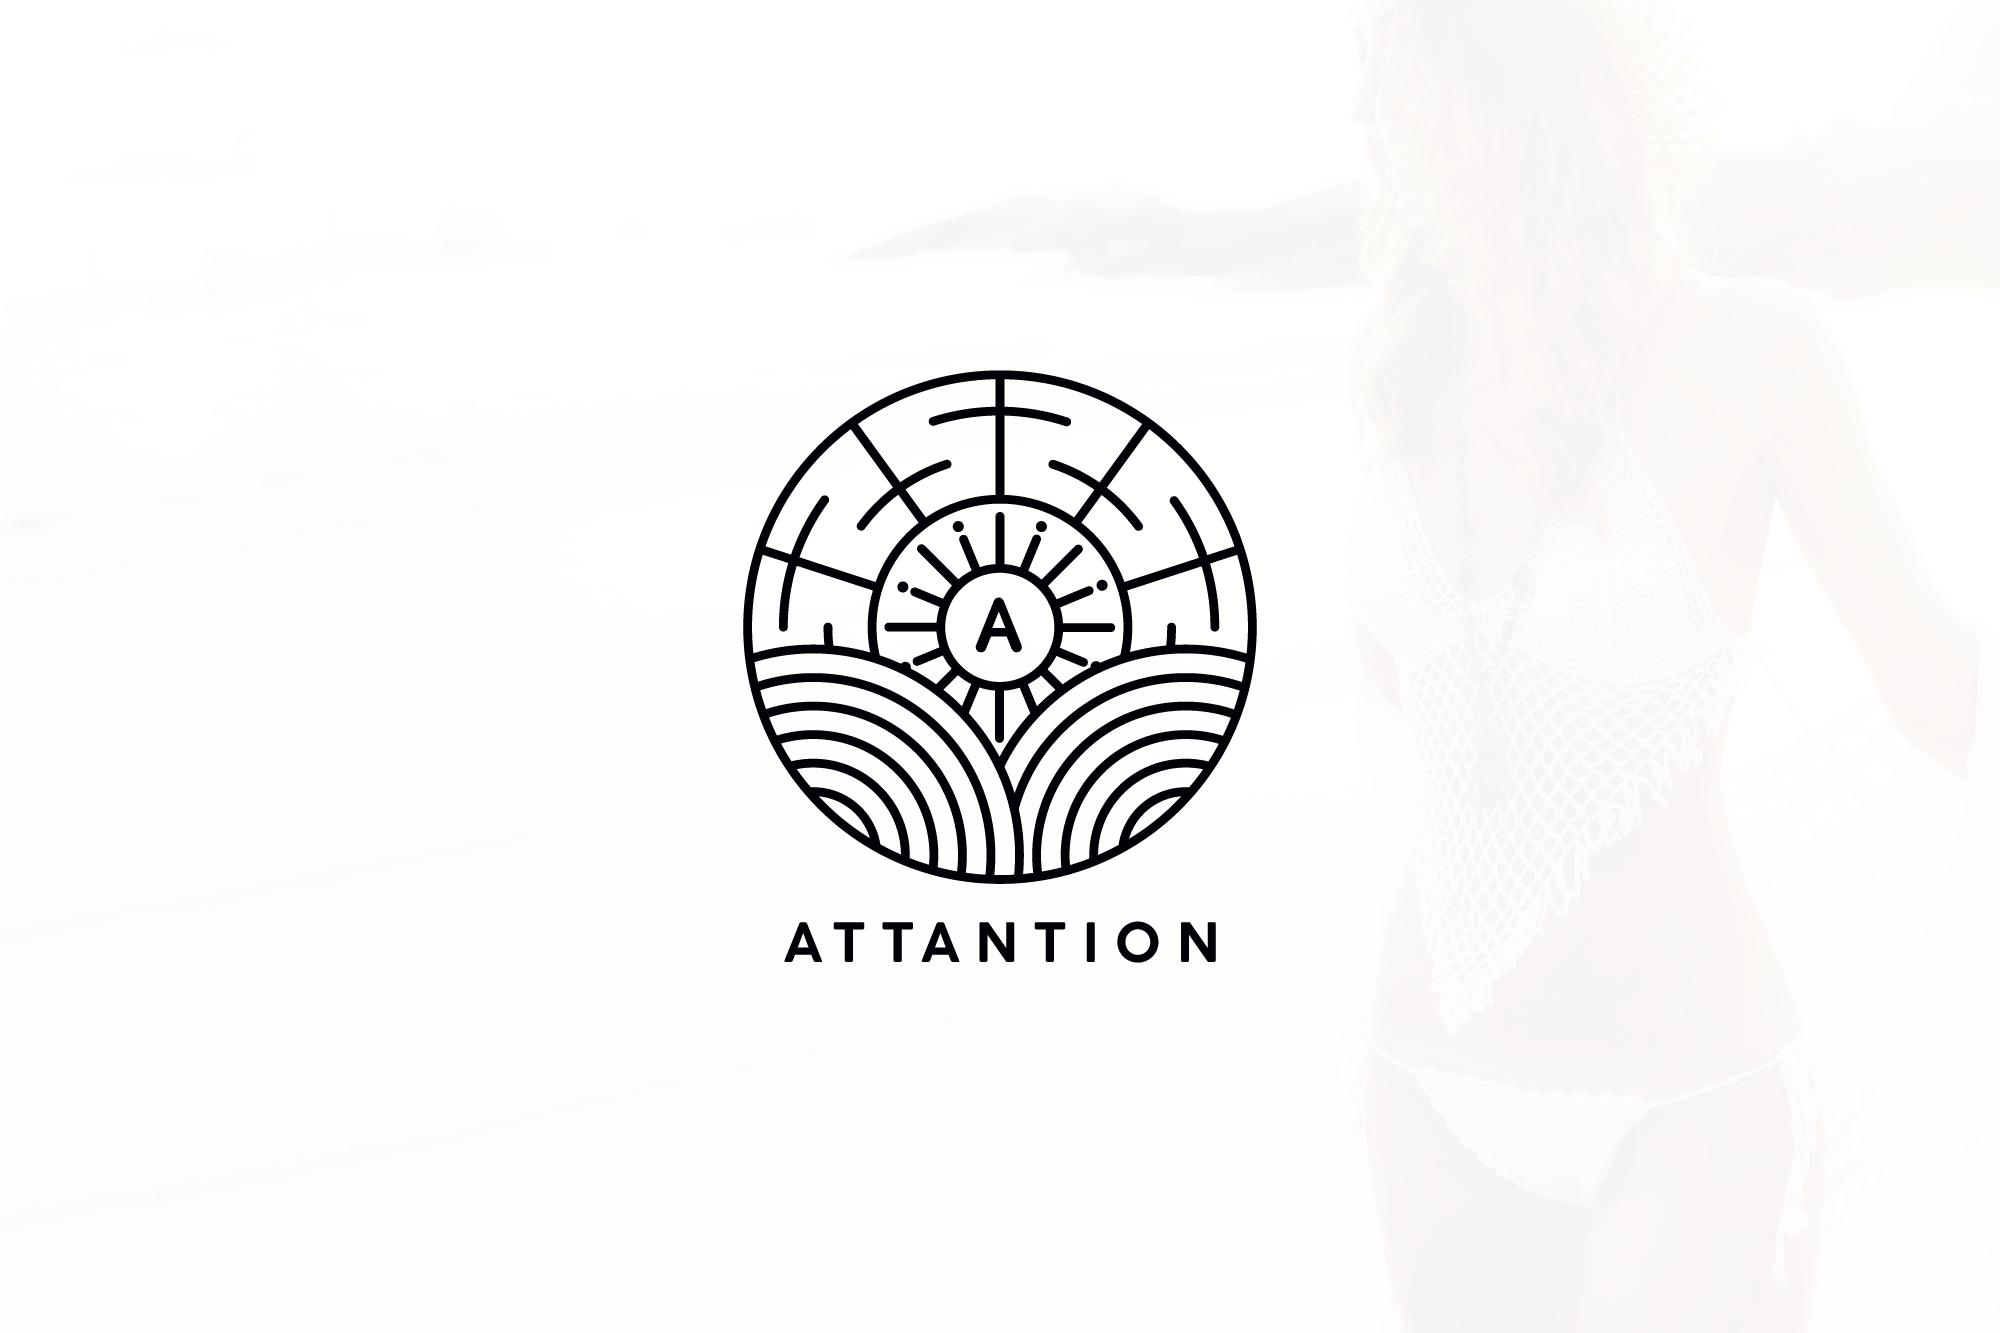 Attantion main logo